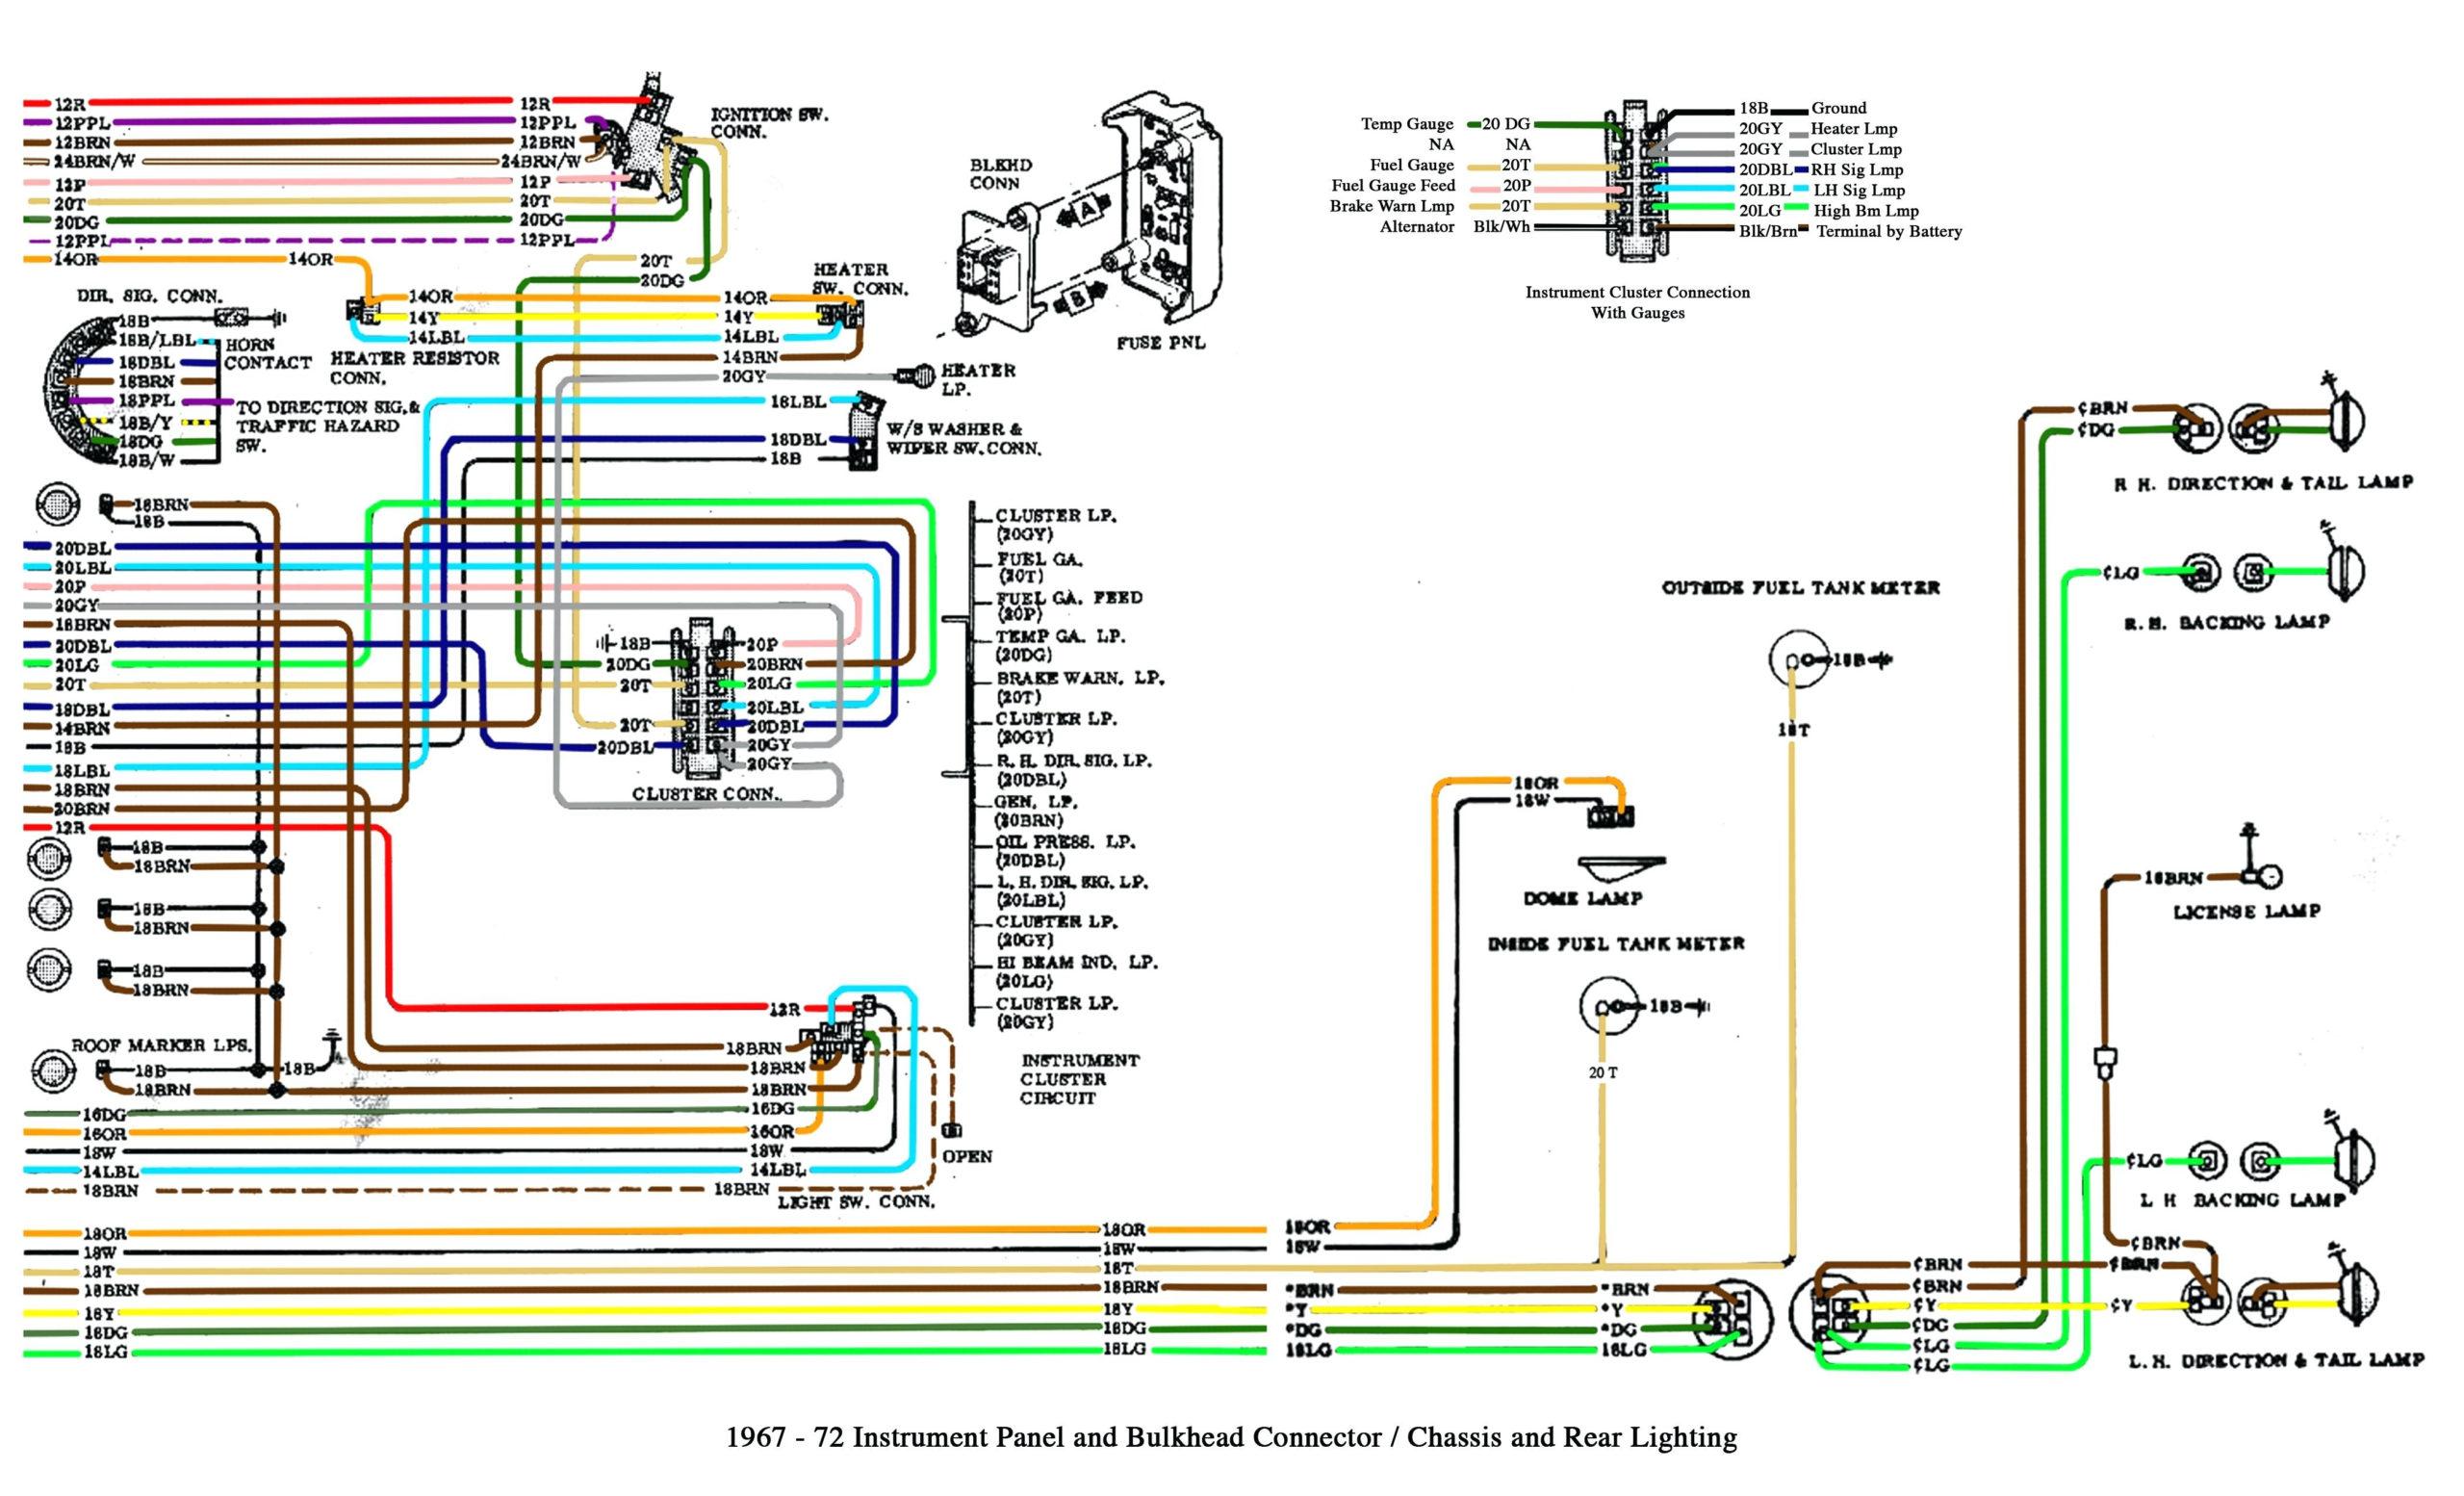 2006 Gmc Trailer Wiring Diagram